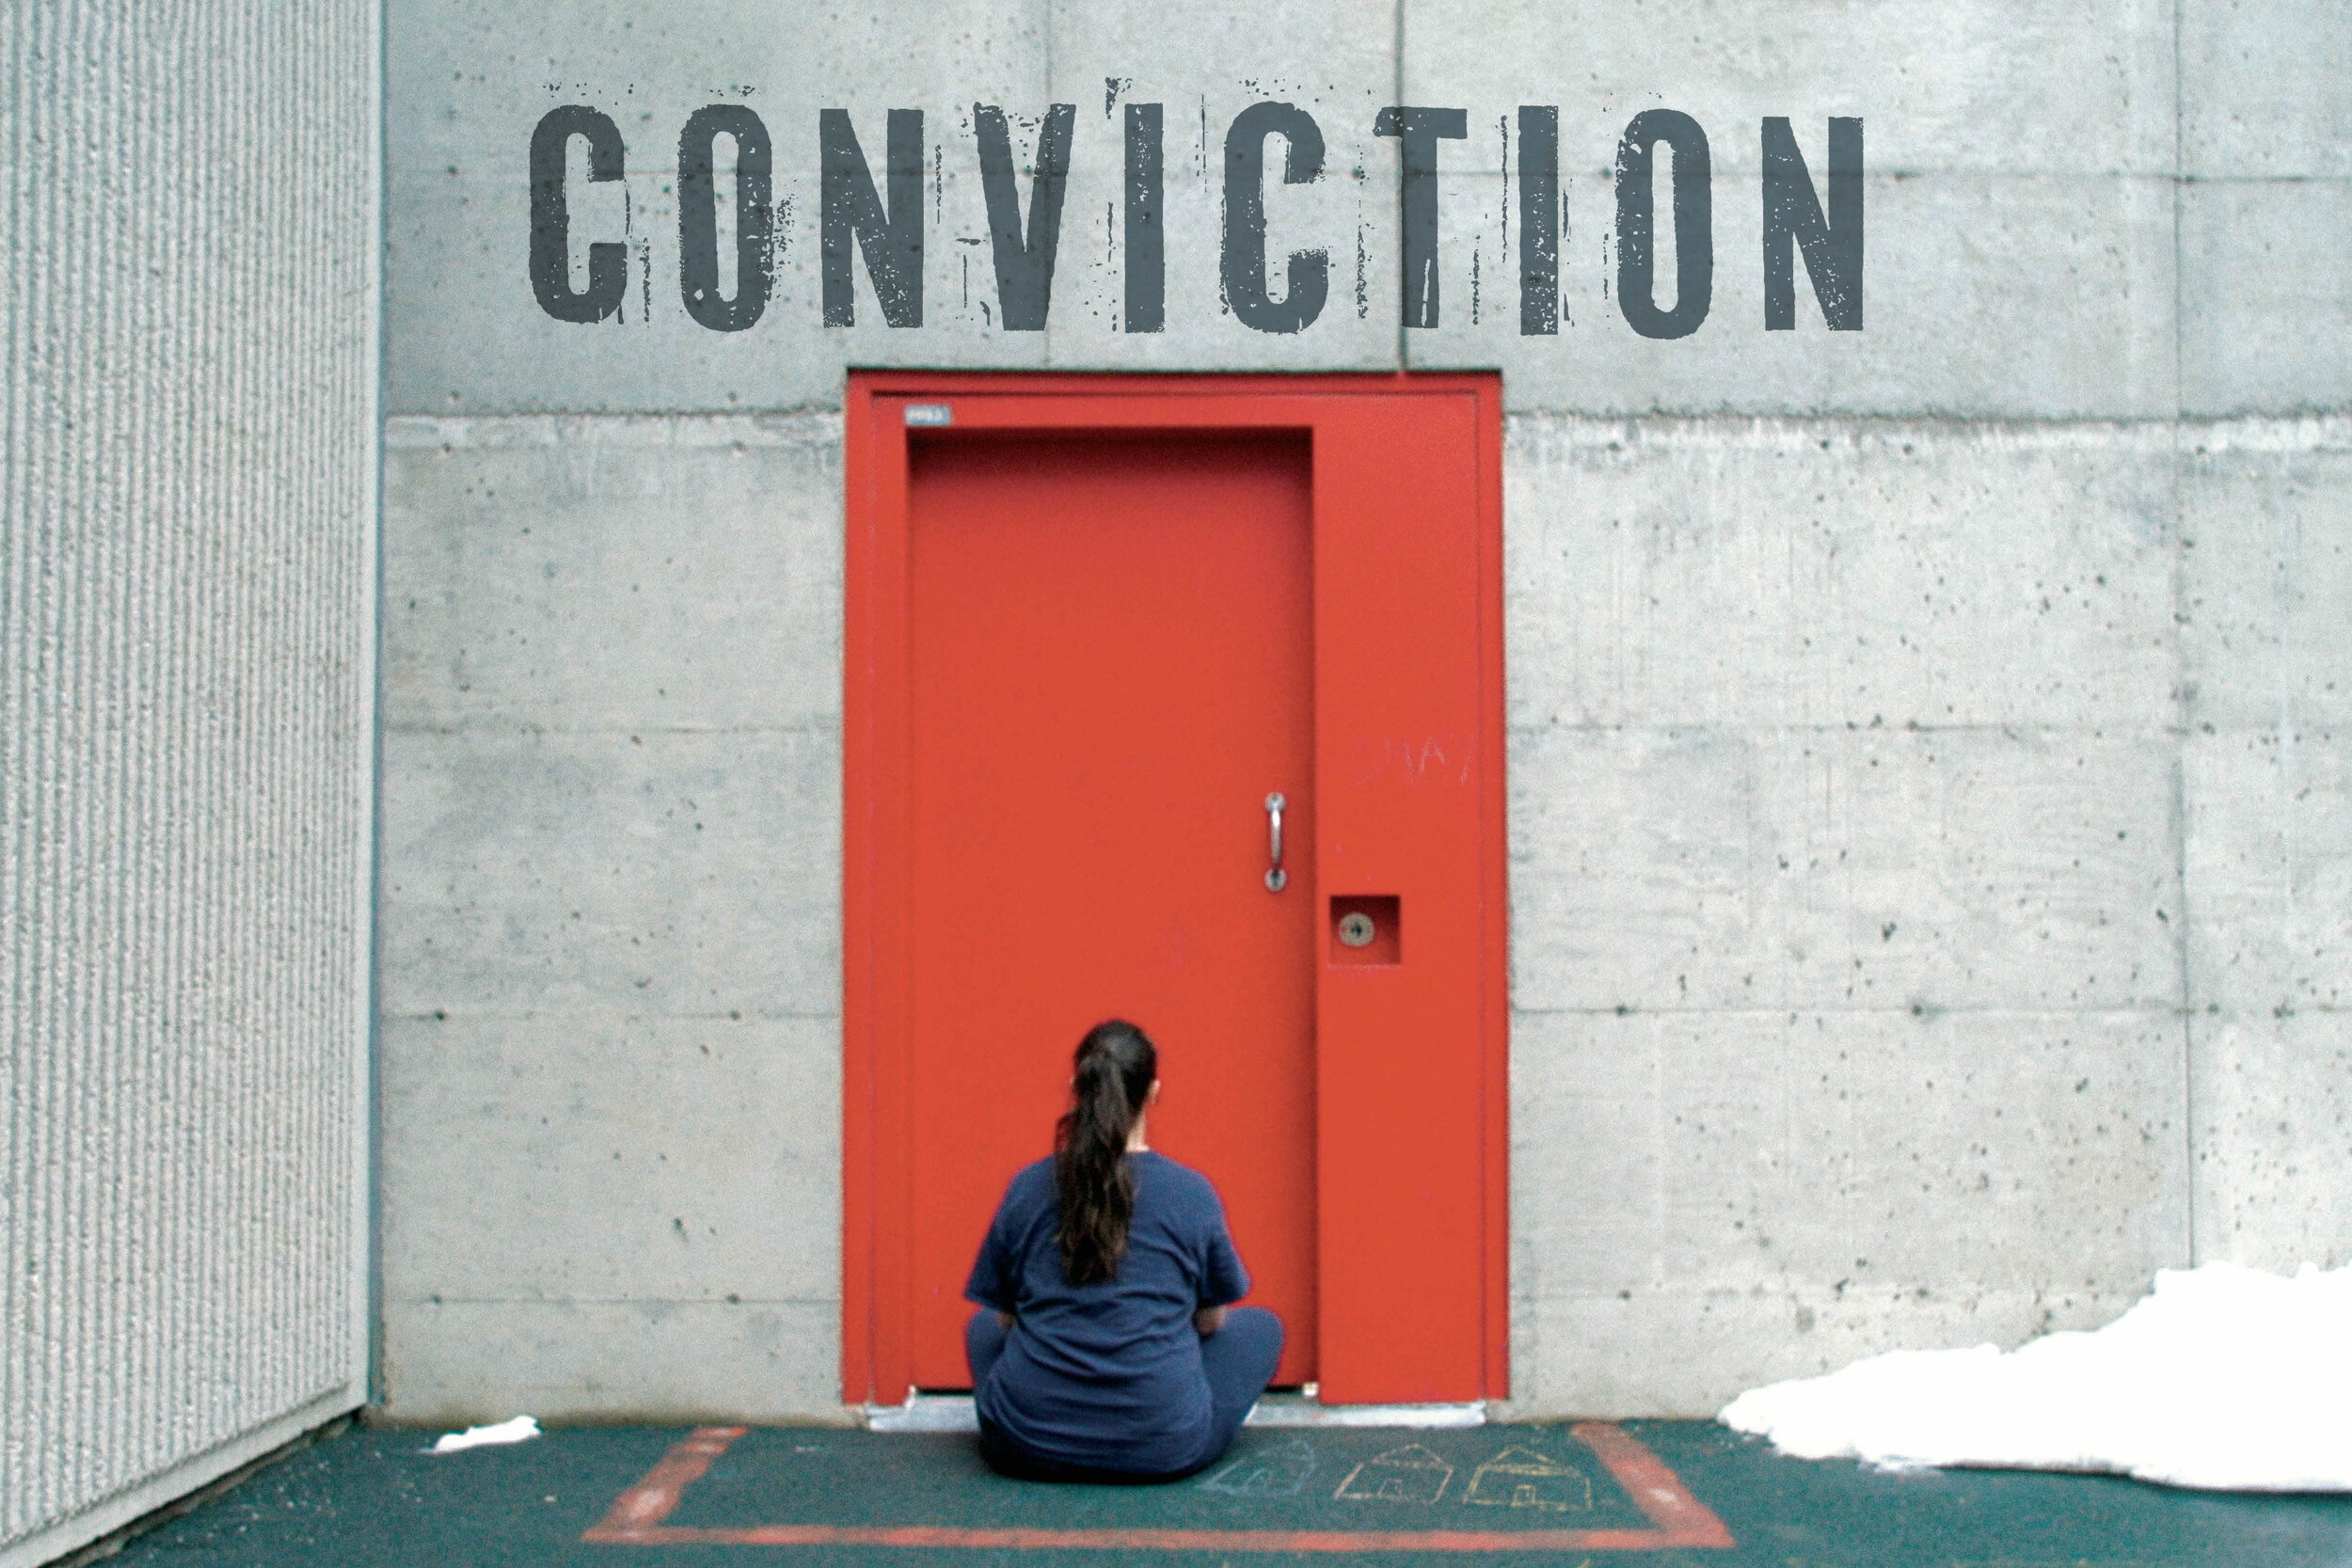 Conviction_Poster promo pic.jpg